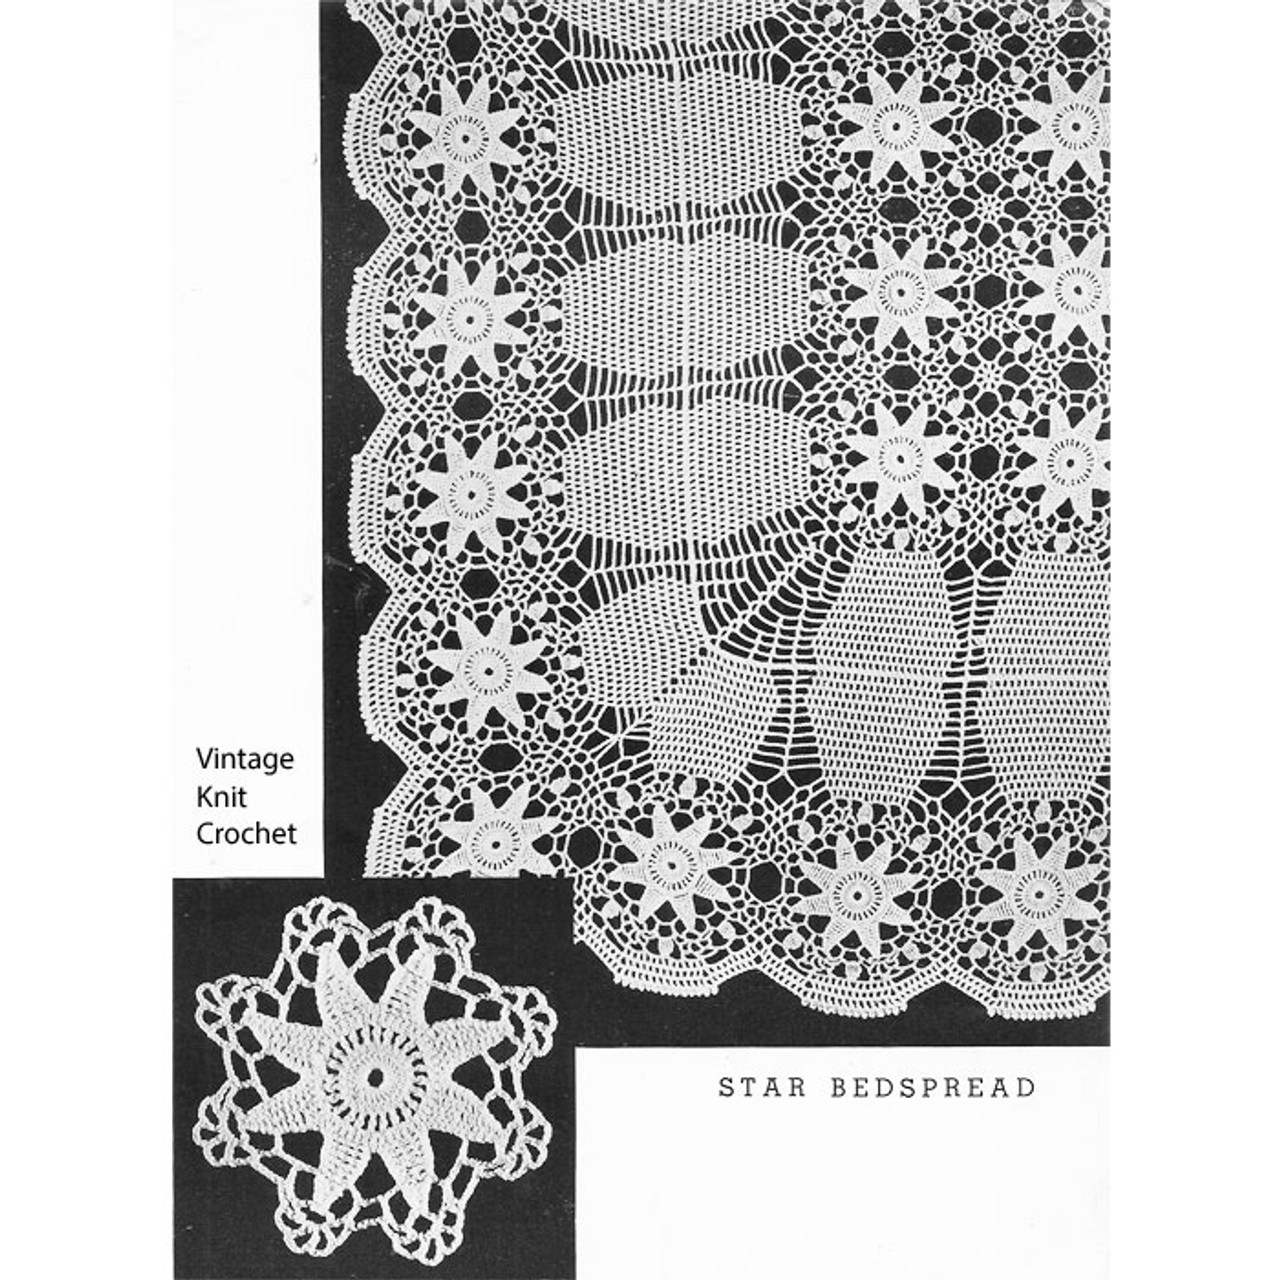 Vintage Lily Mills Crochet Star Medallion Bedspread Pattern No 623